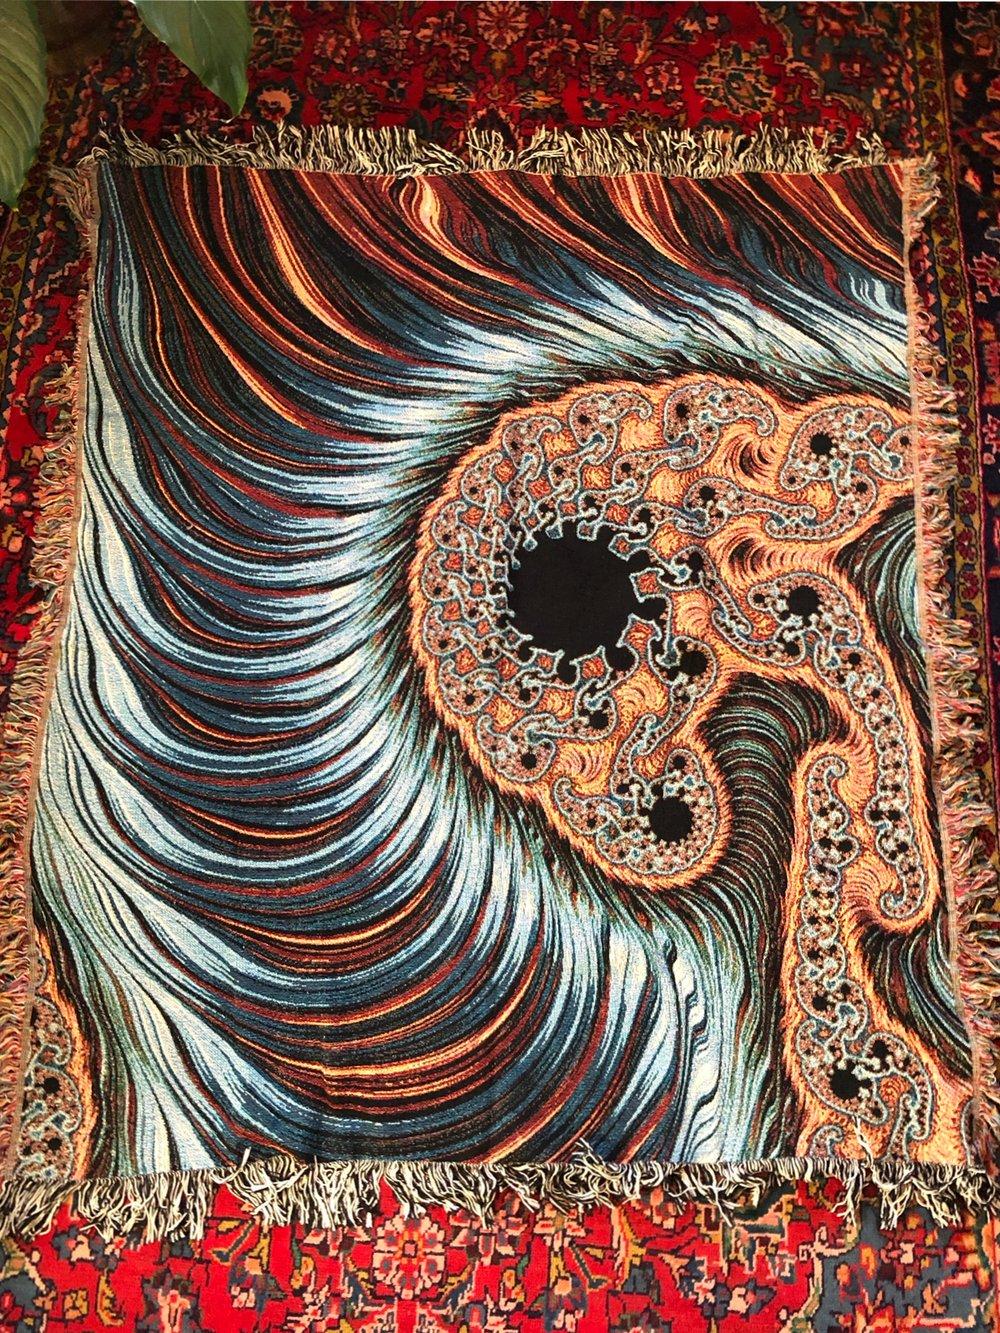 Woven Blanket #20